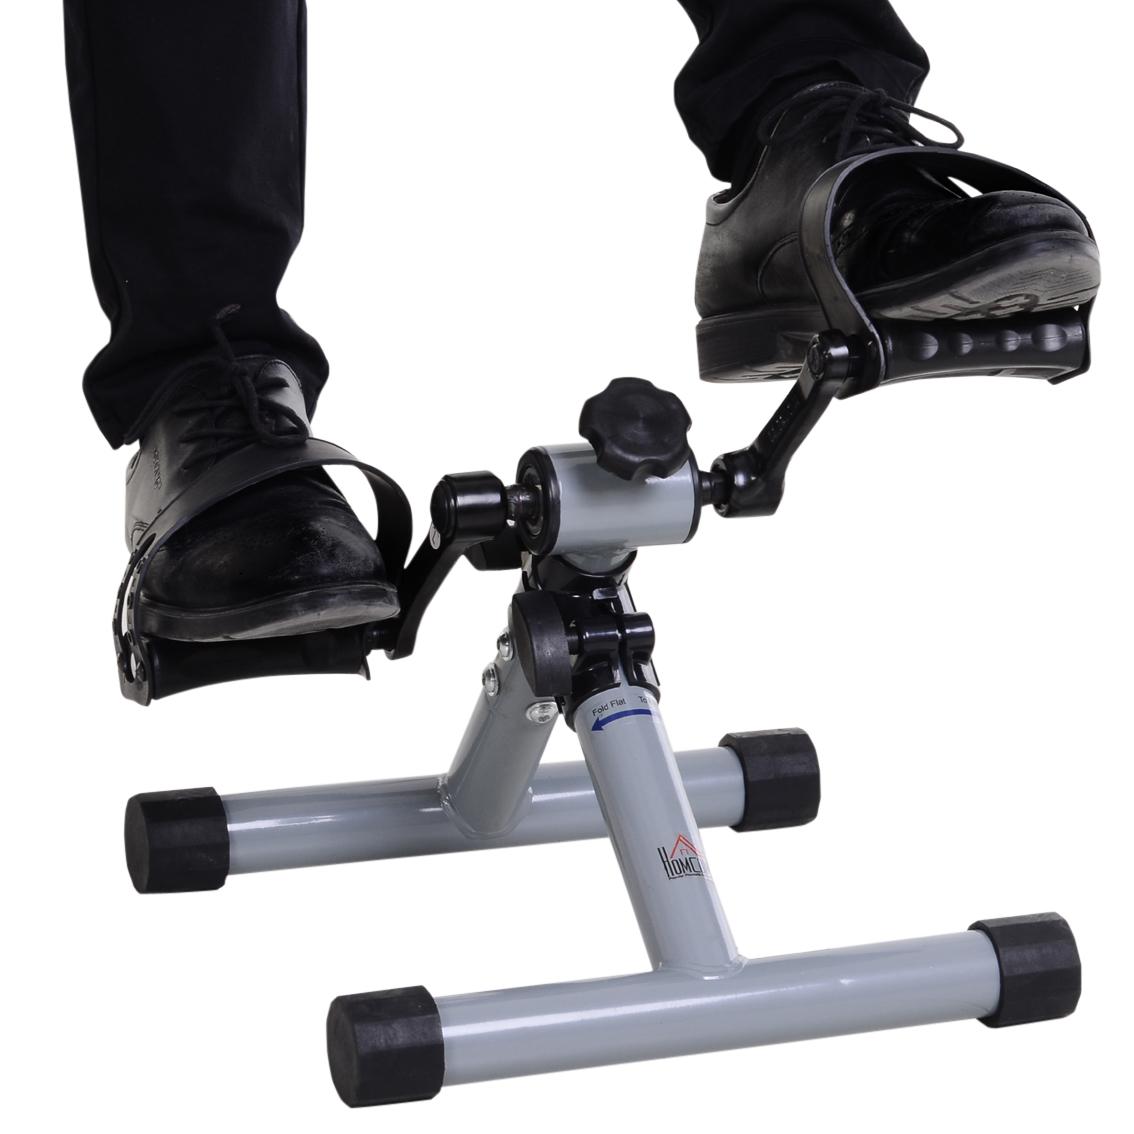 HOMCOM Heimtrainer Mini Bike Pedaltrainer Magnetwiderstand LCD-Display Stahl